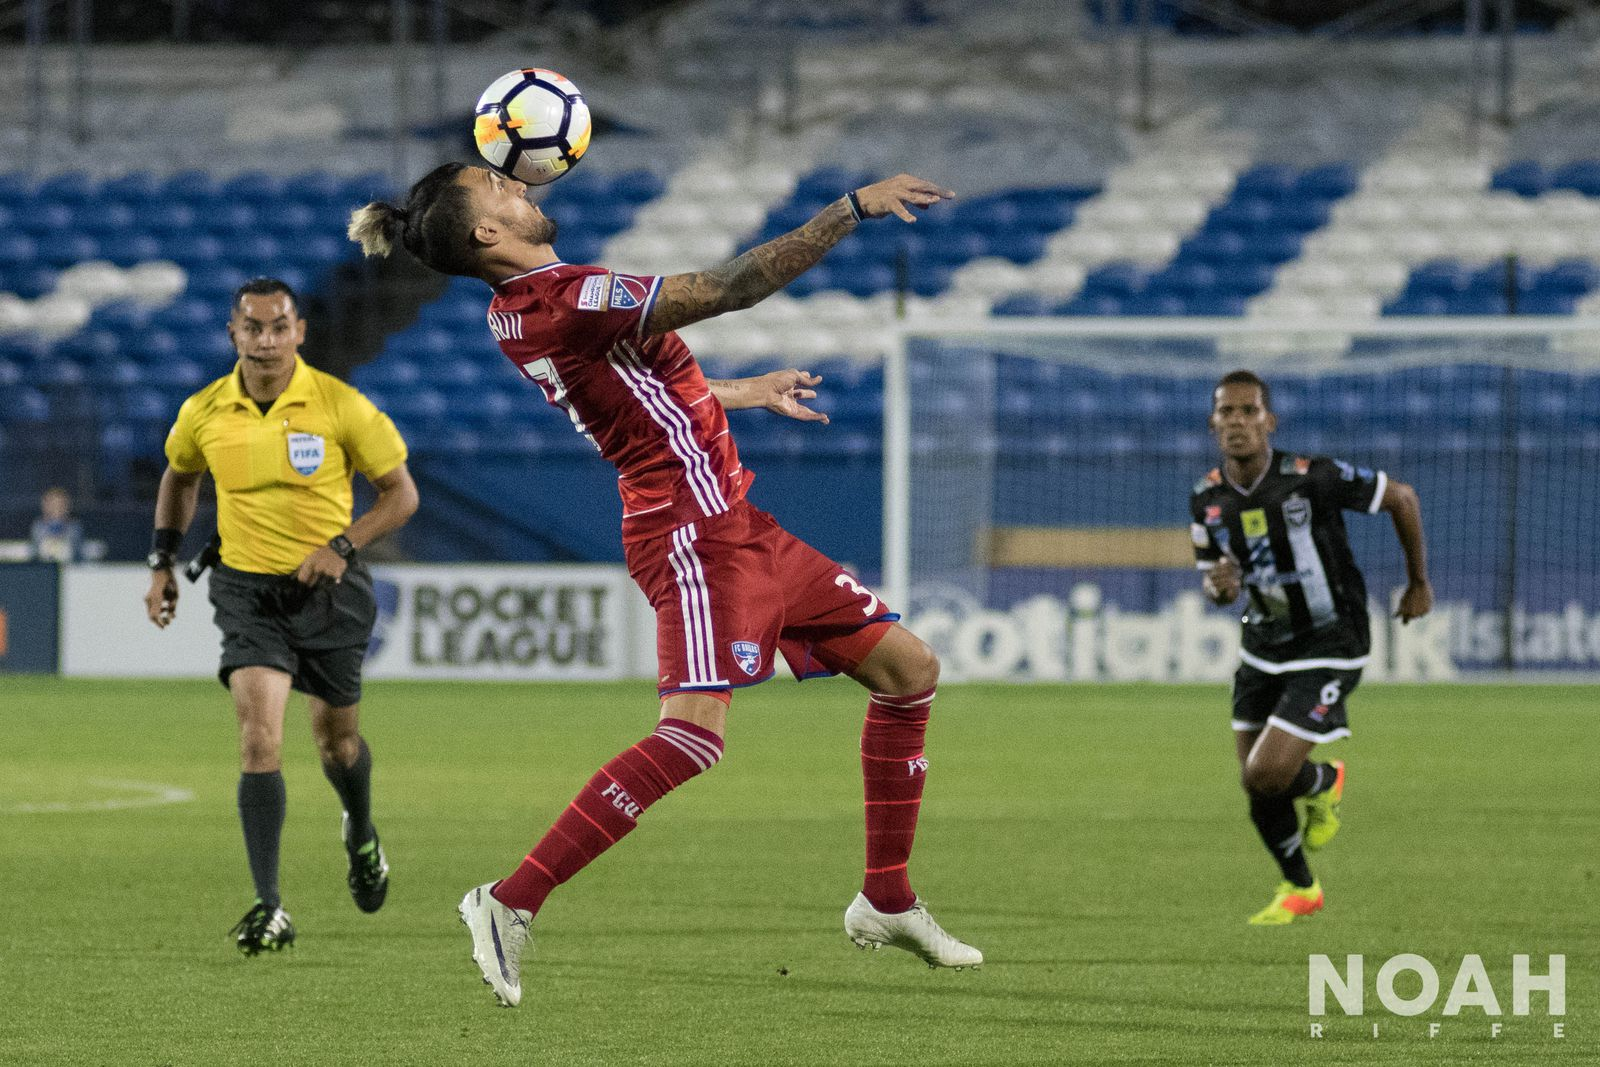 FC Dallas vs. Tauro FC: Match Photos - By: Noah Riffe